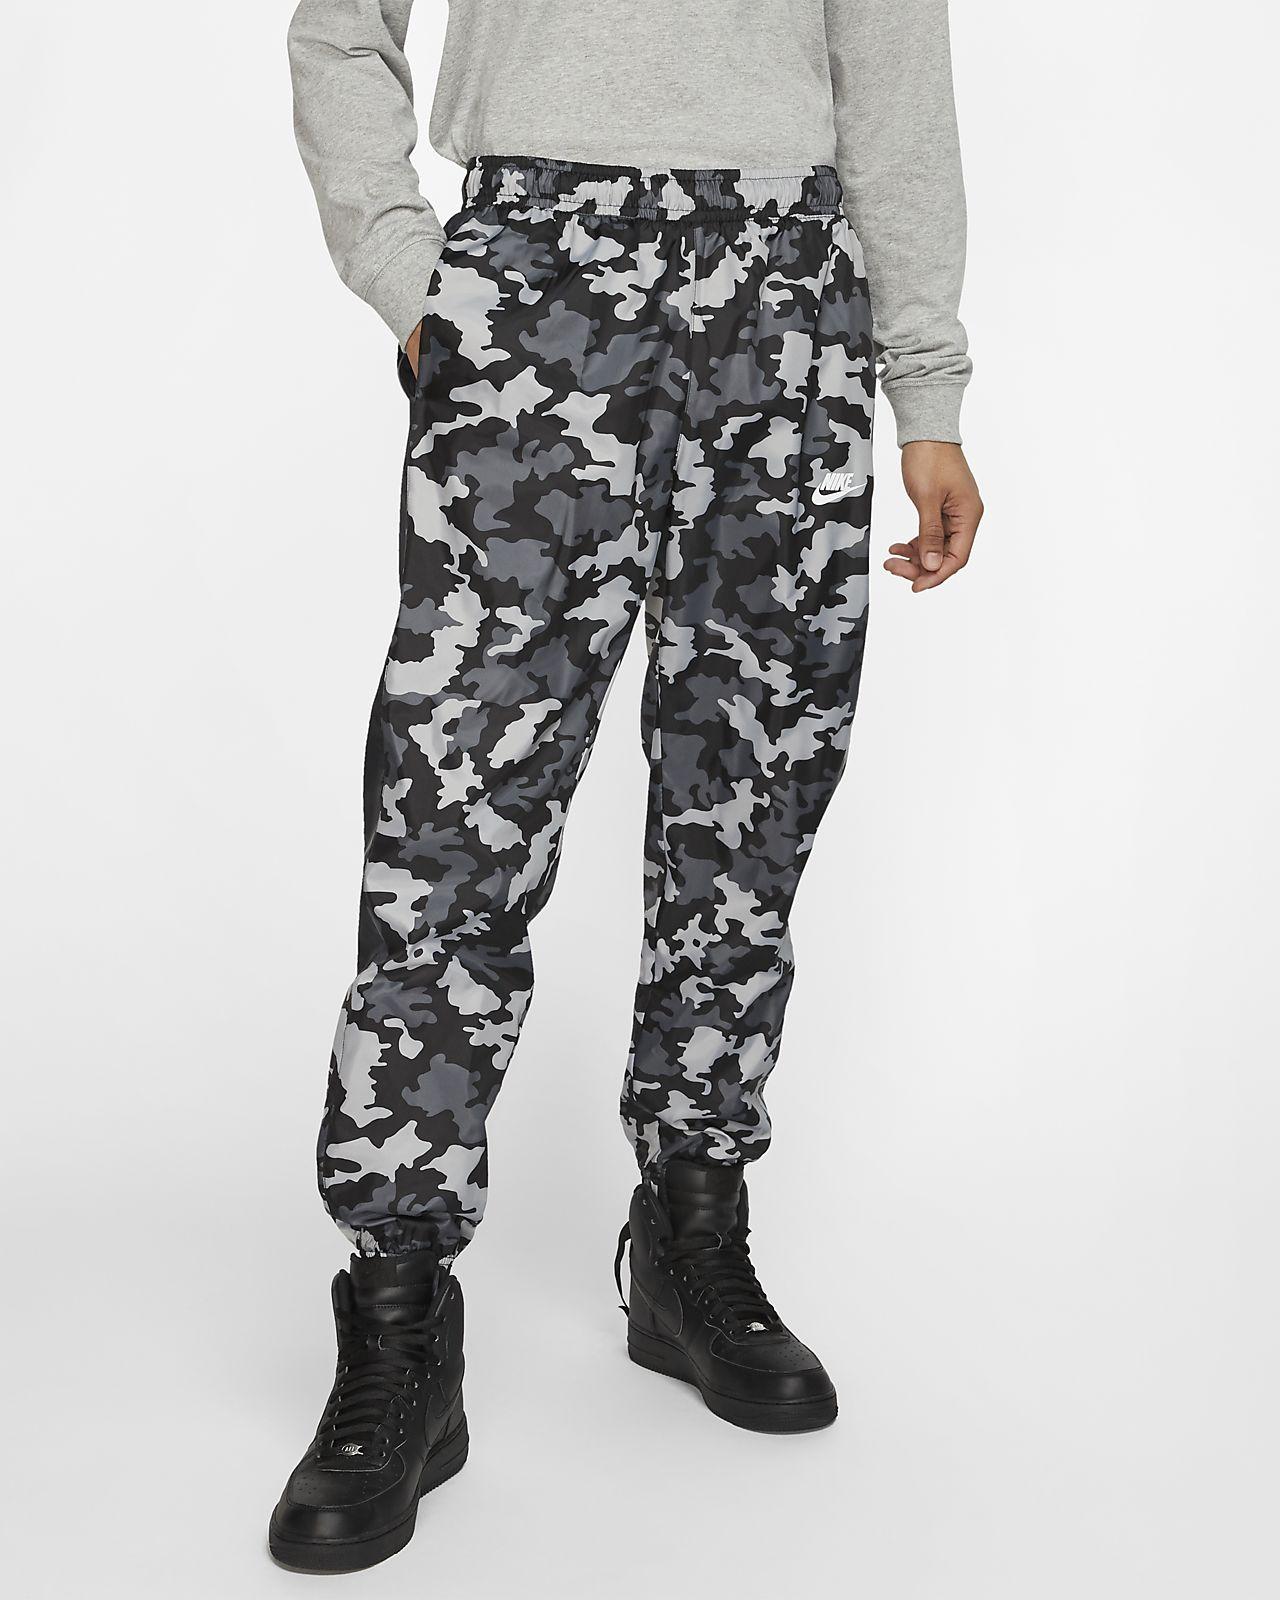 pantalon survetement tissé homme nike